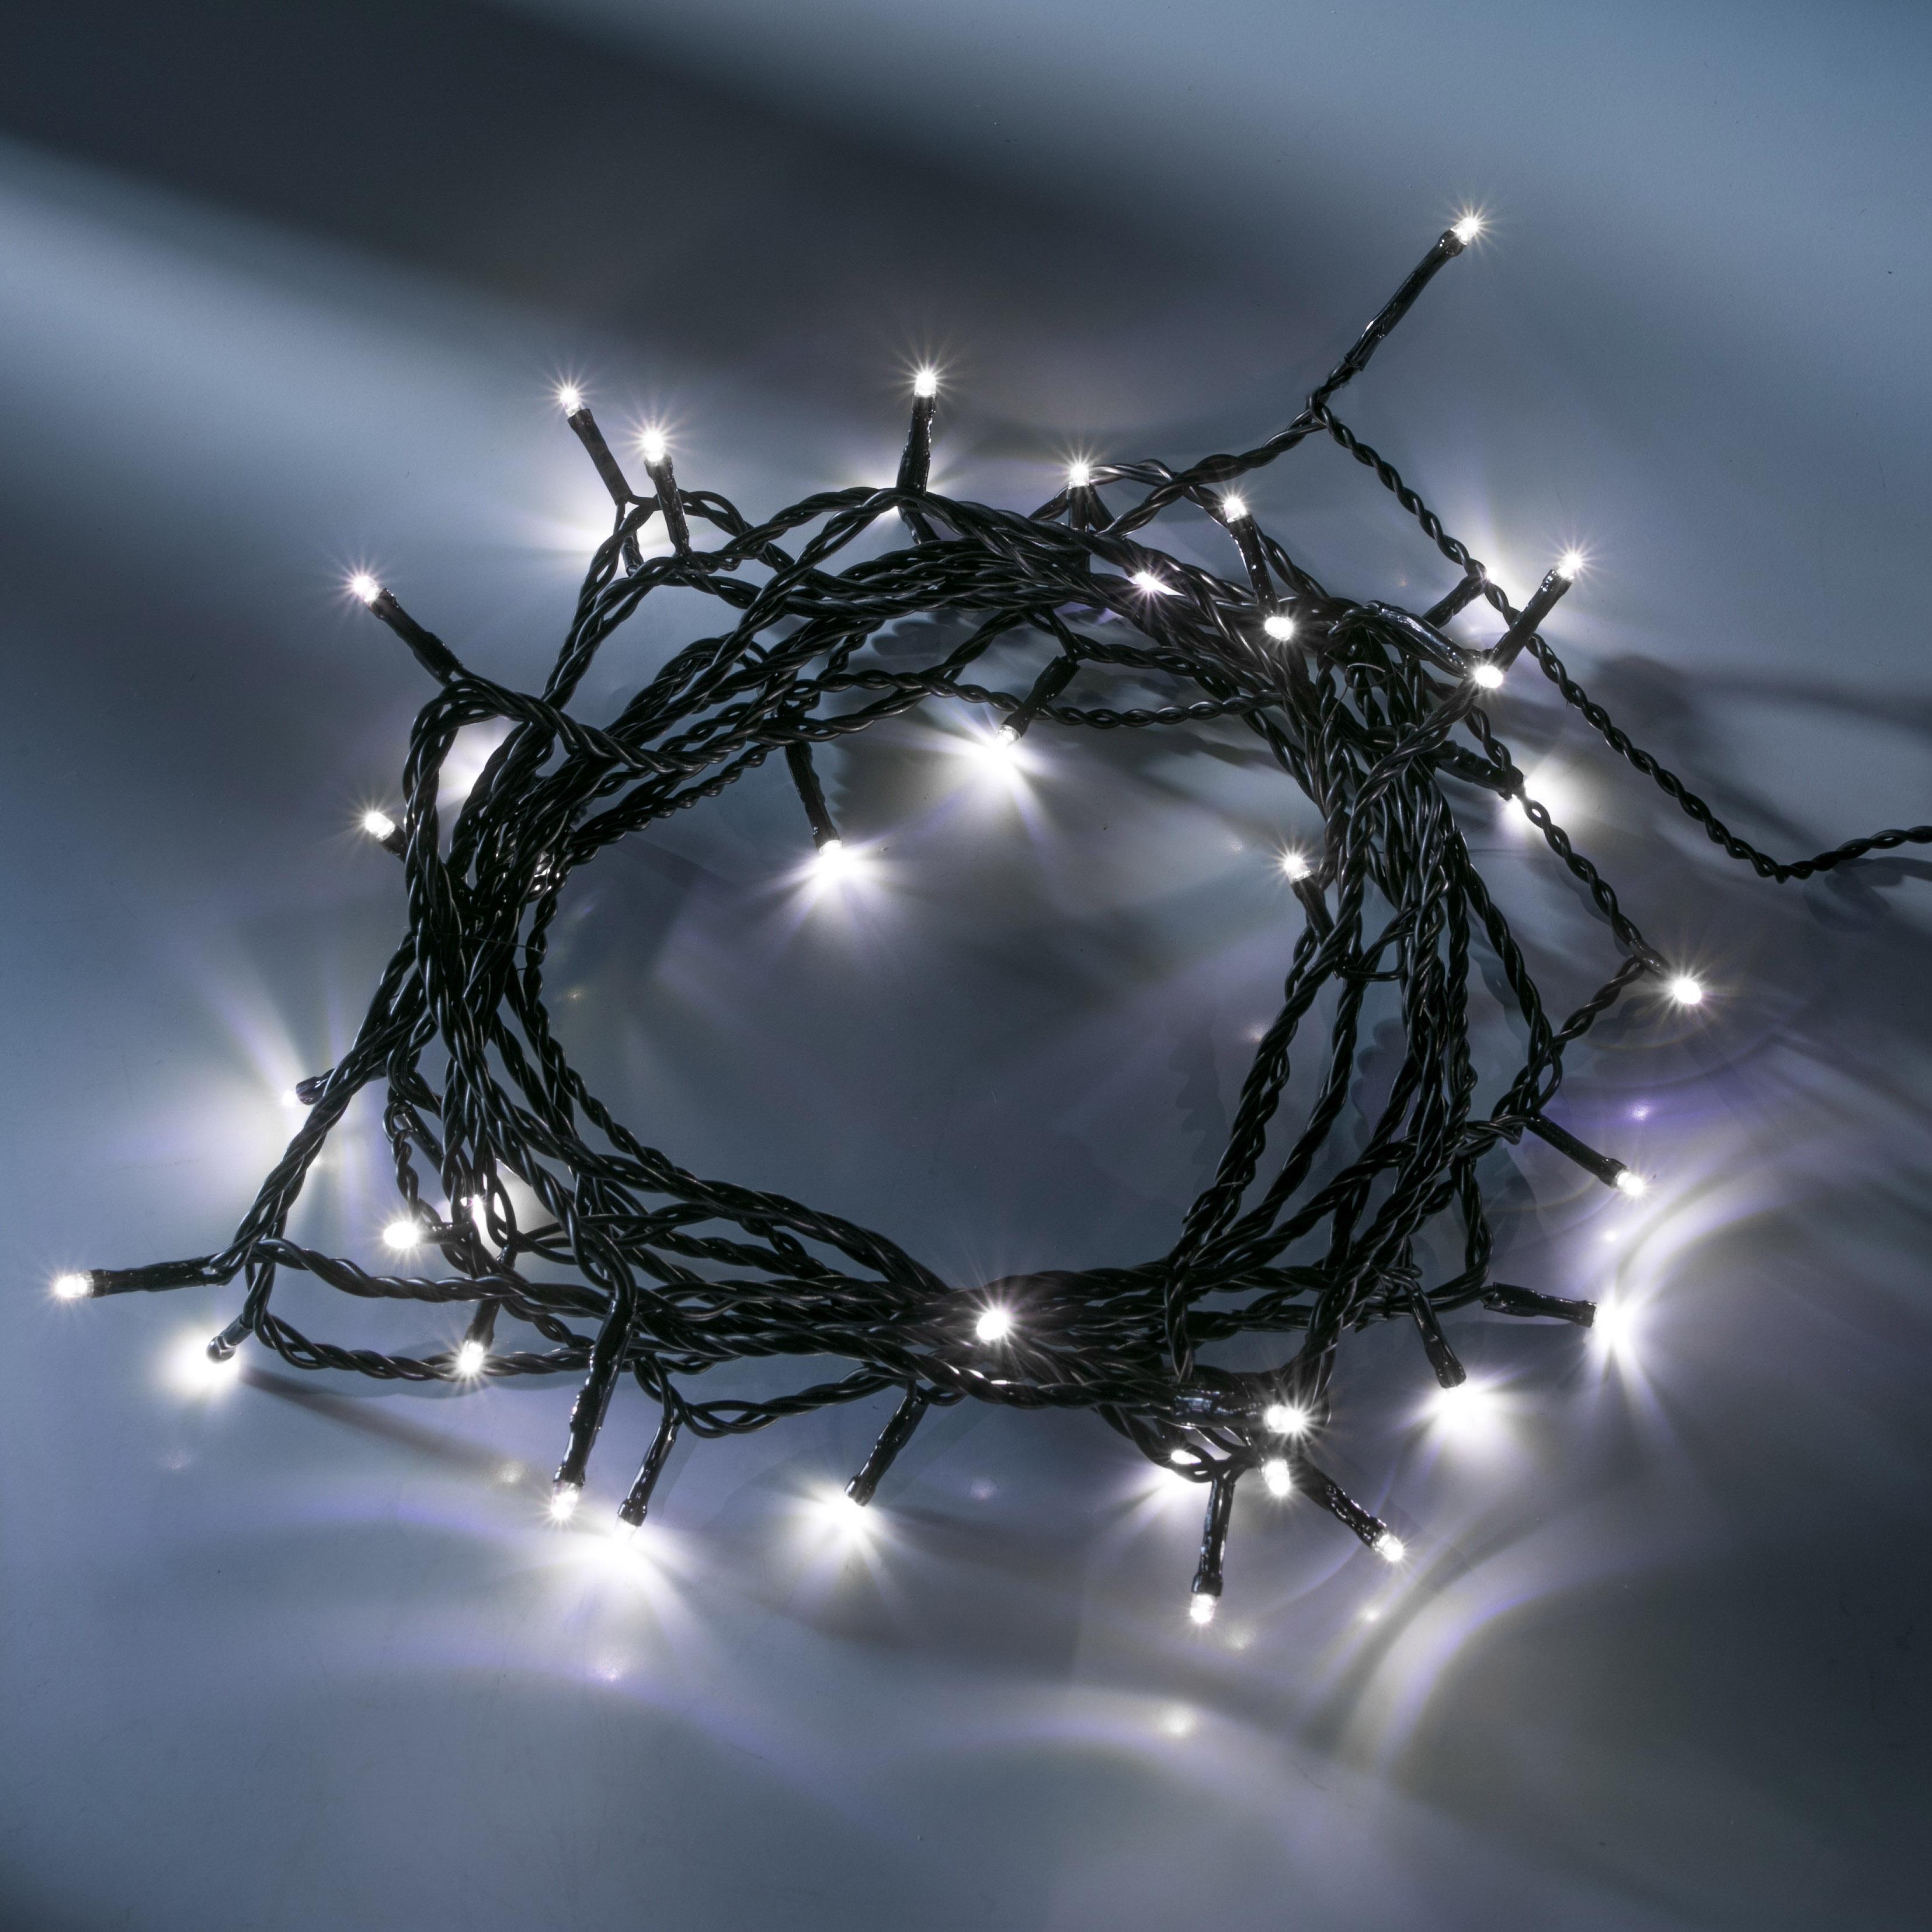 Konstsmide LED-Lichterkette, weiß, 16m, 40 LEDs 3610-200